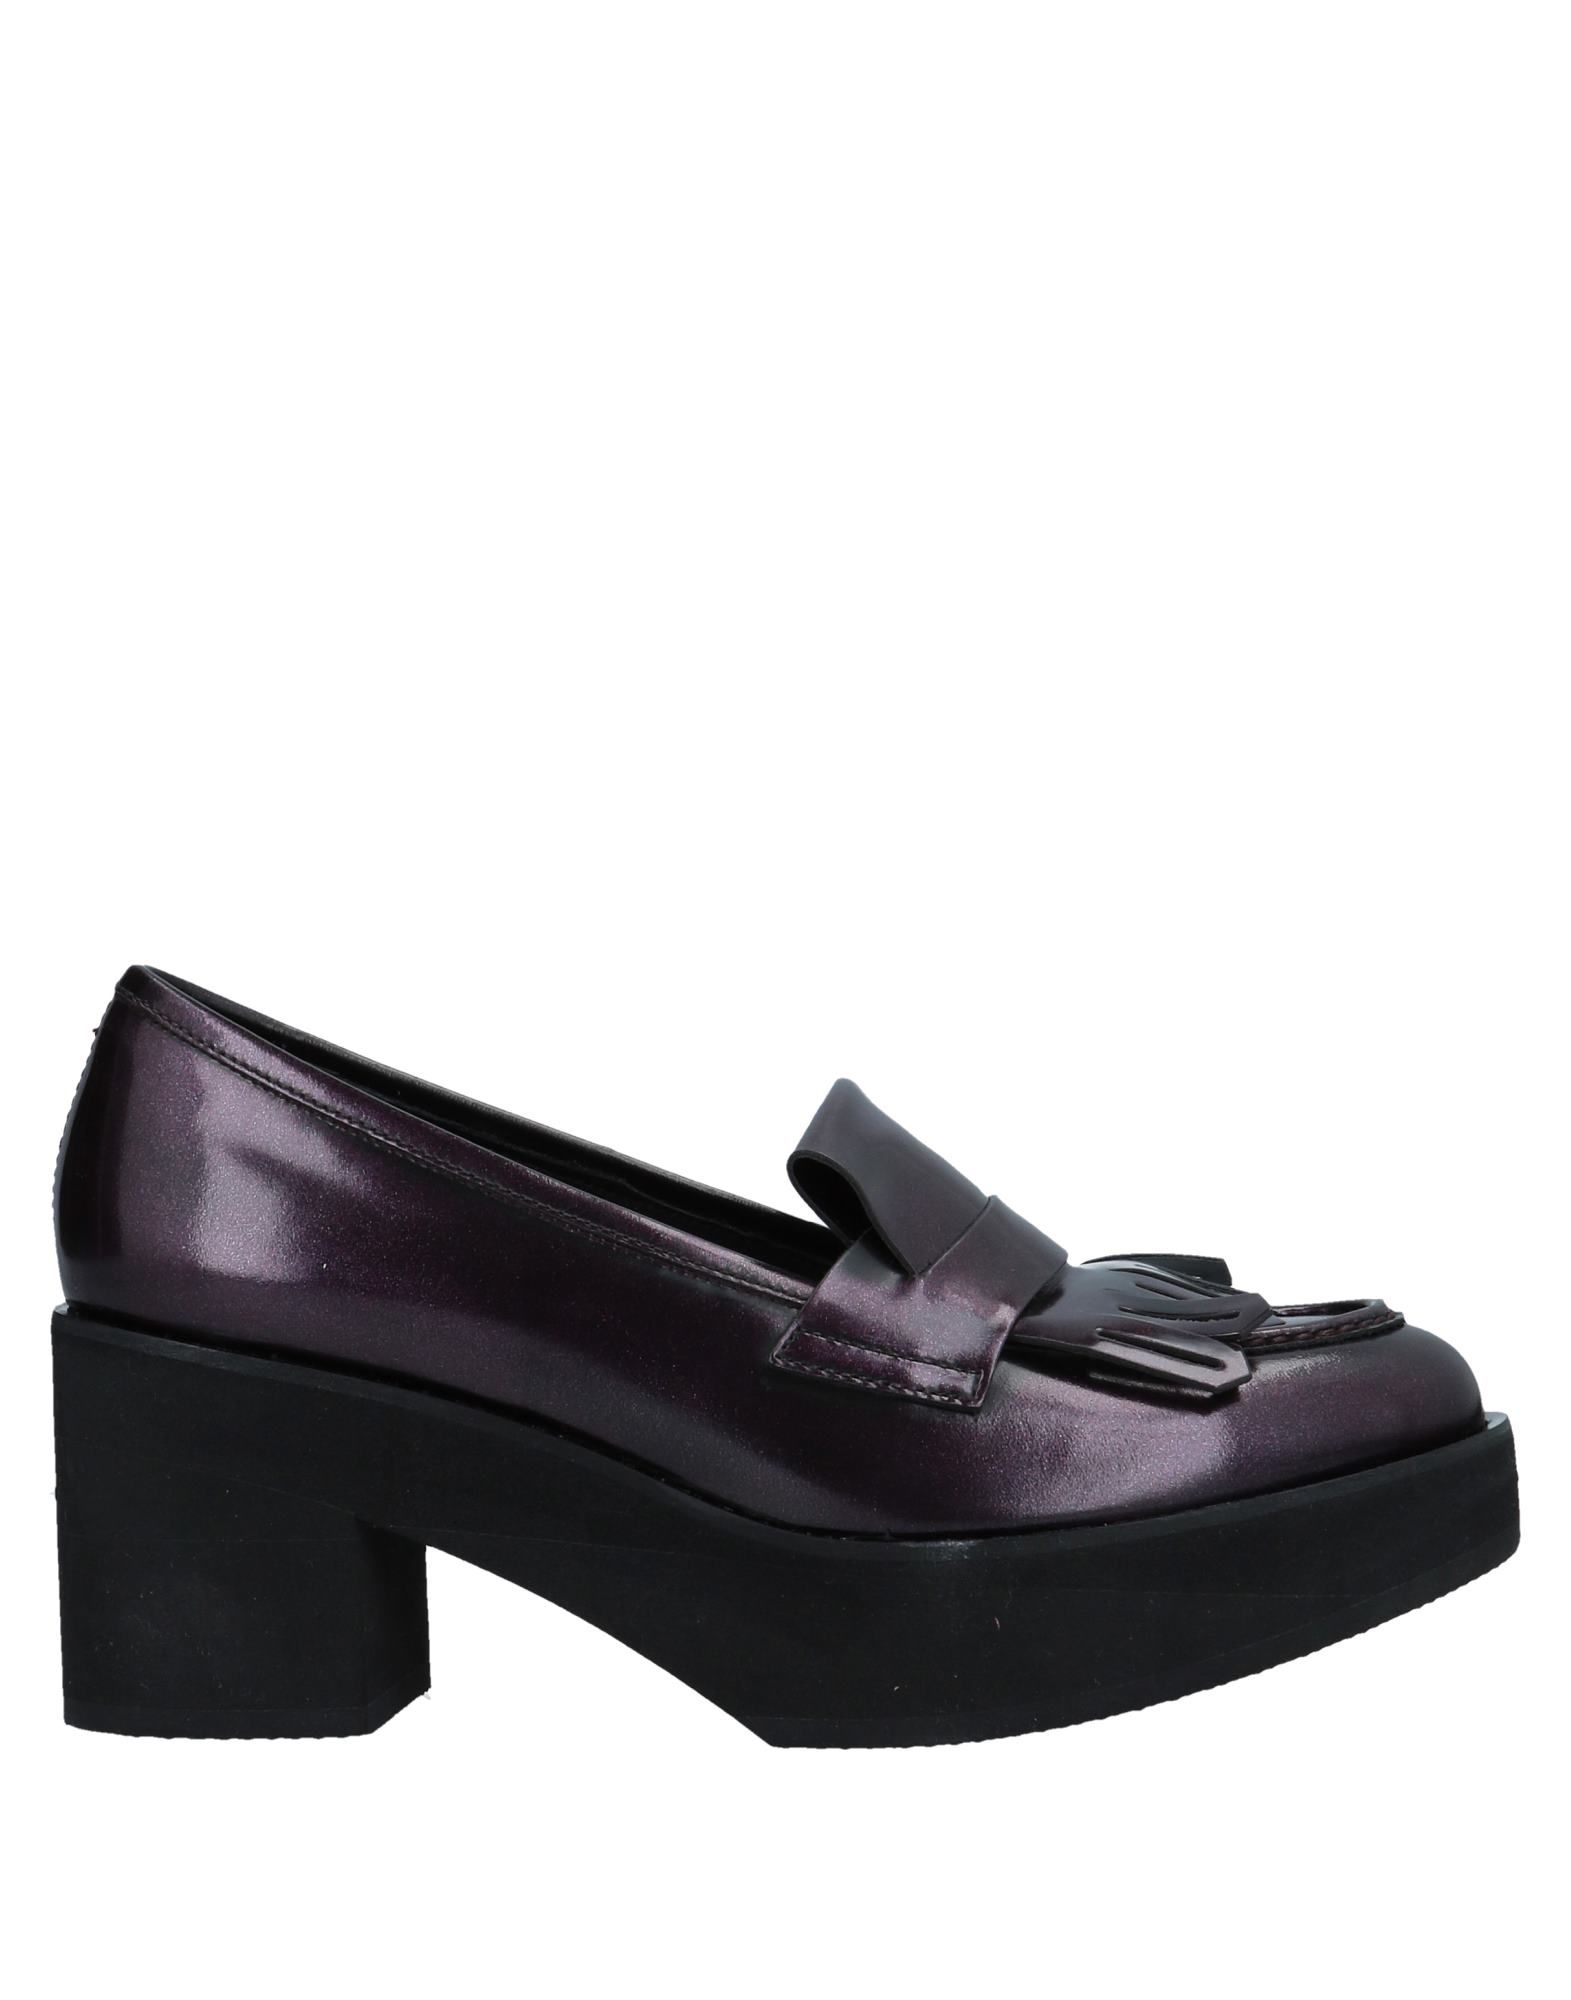 Fratelli Rossetti Mokassins Damen  11548534DTGut aussehende strapazierfähige Schuhe